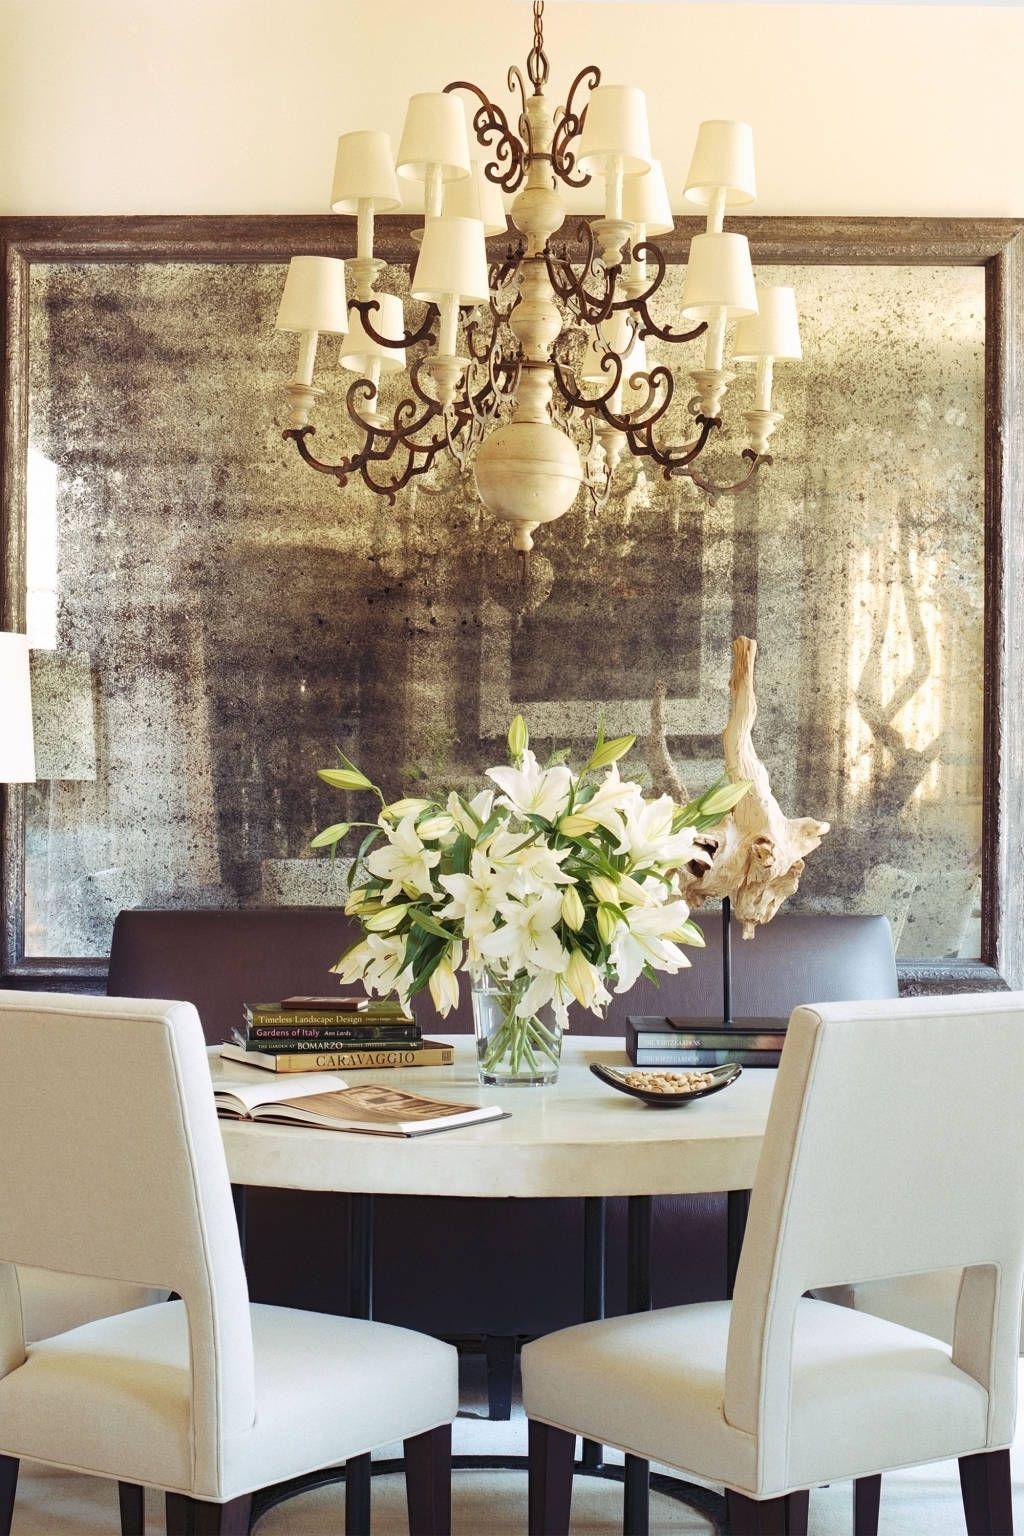 Thelist Interior Designer Susan Ferrier Shares Her Fall